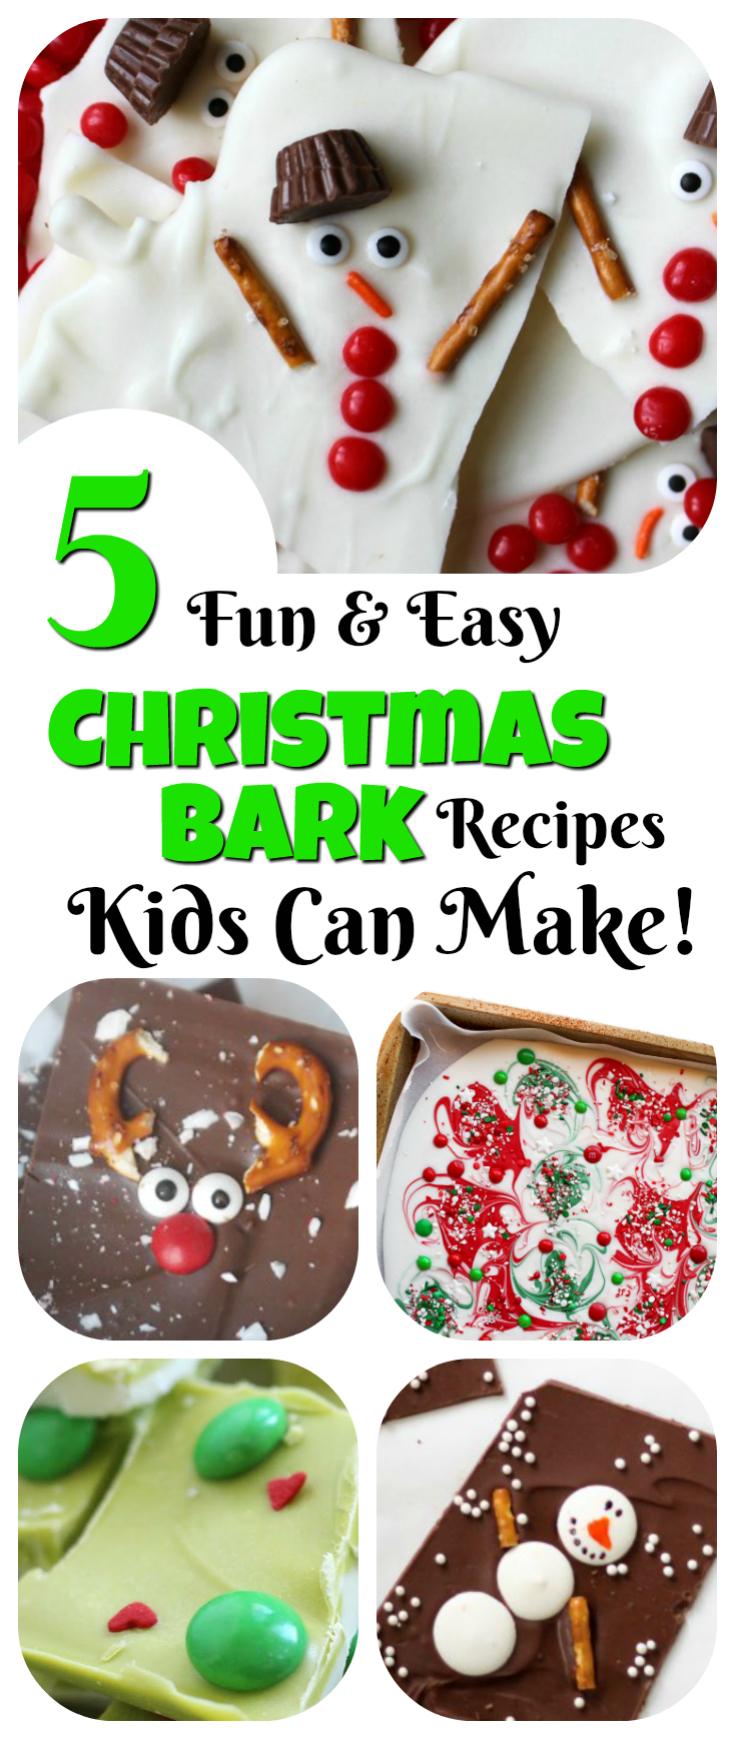 Christmas Bark Kids Can Make: 5 Fun Ideas! | Letters from Santa Blog